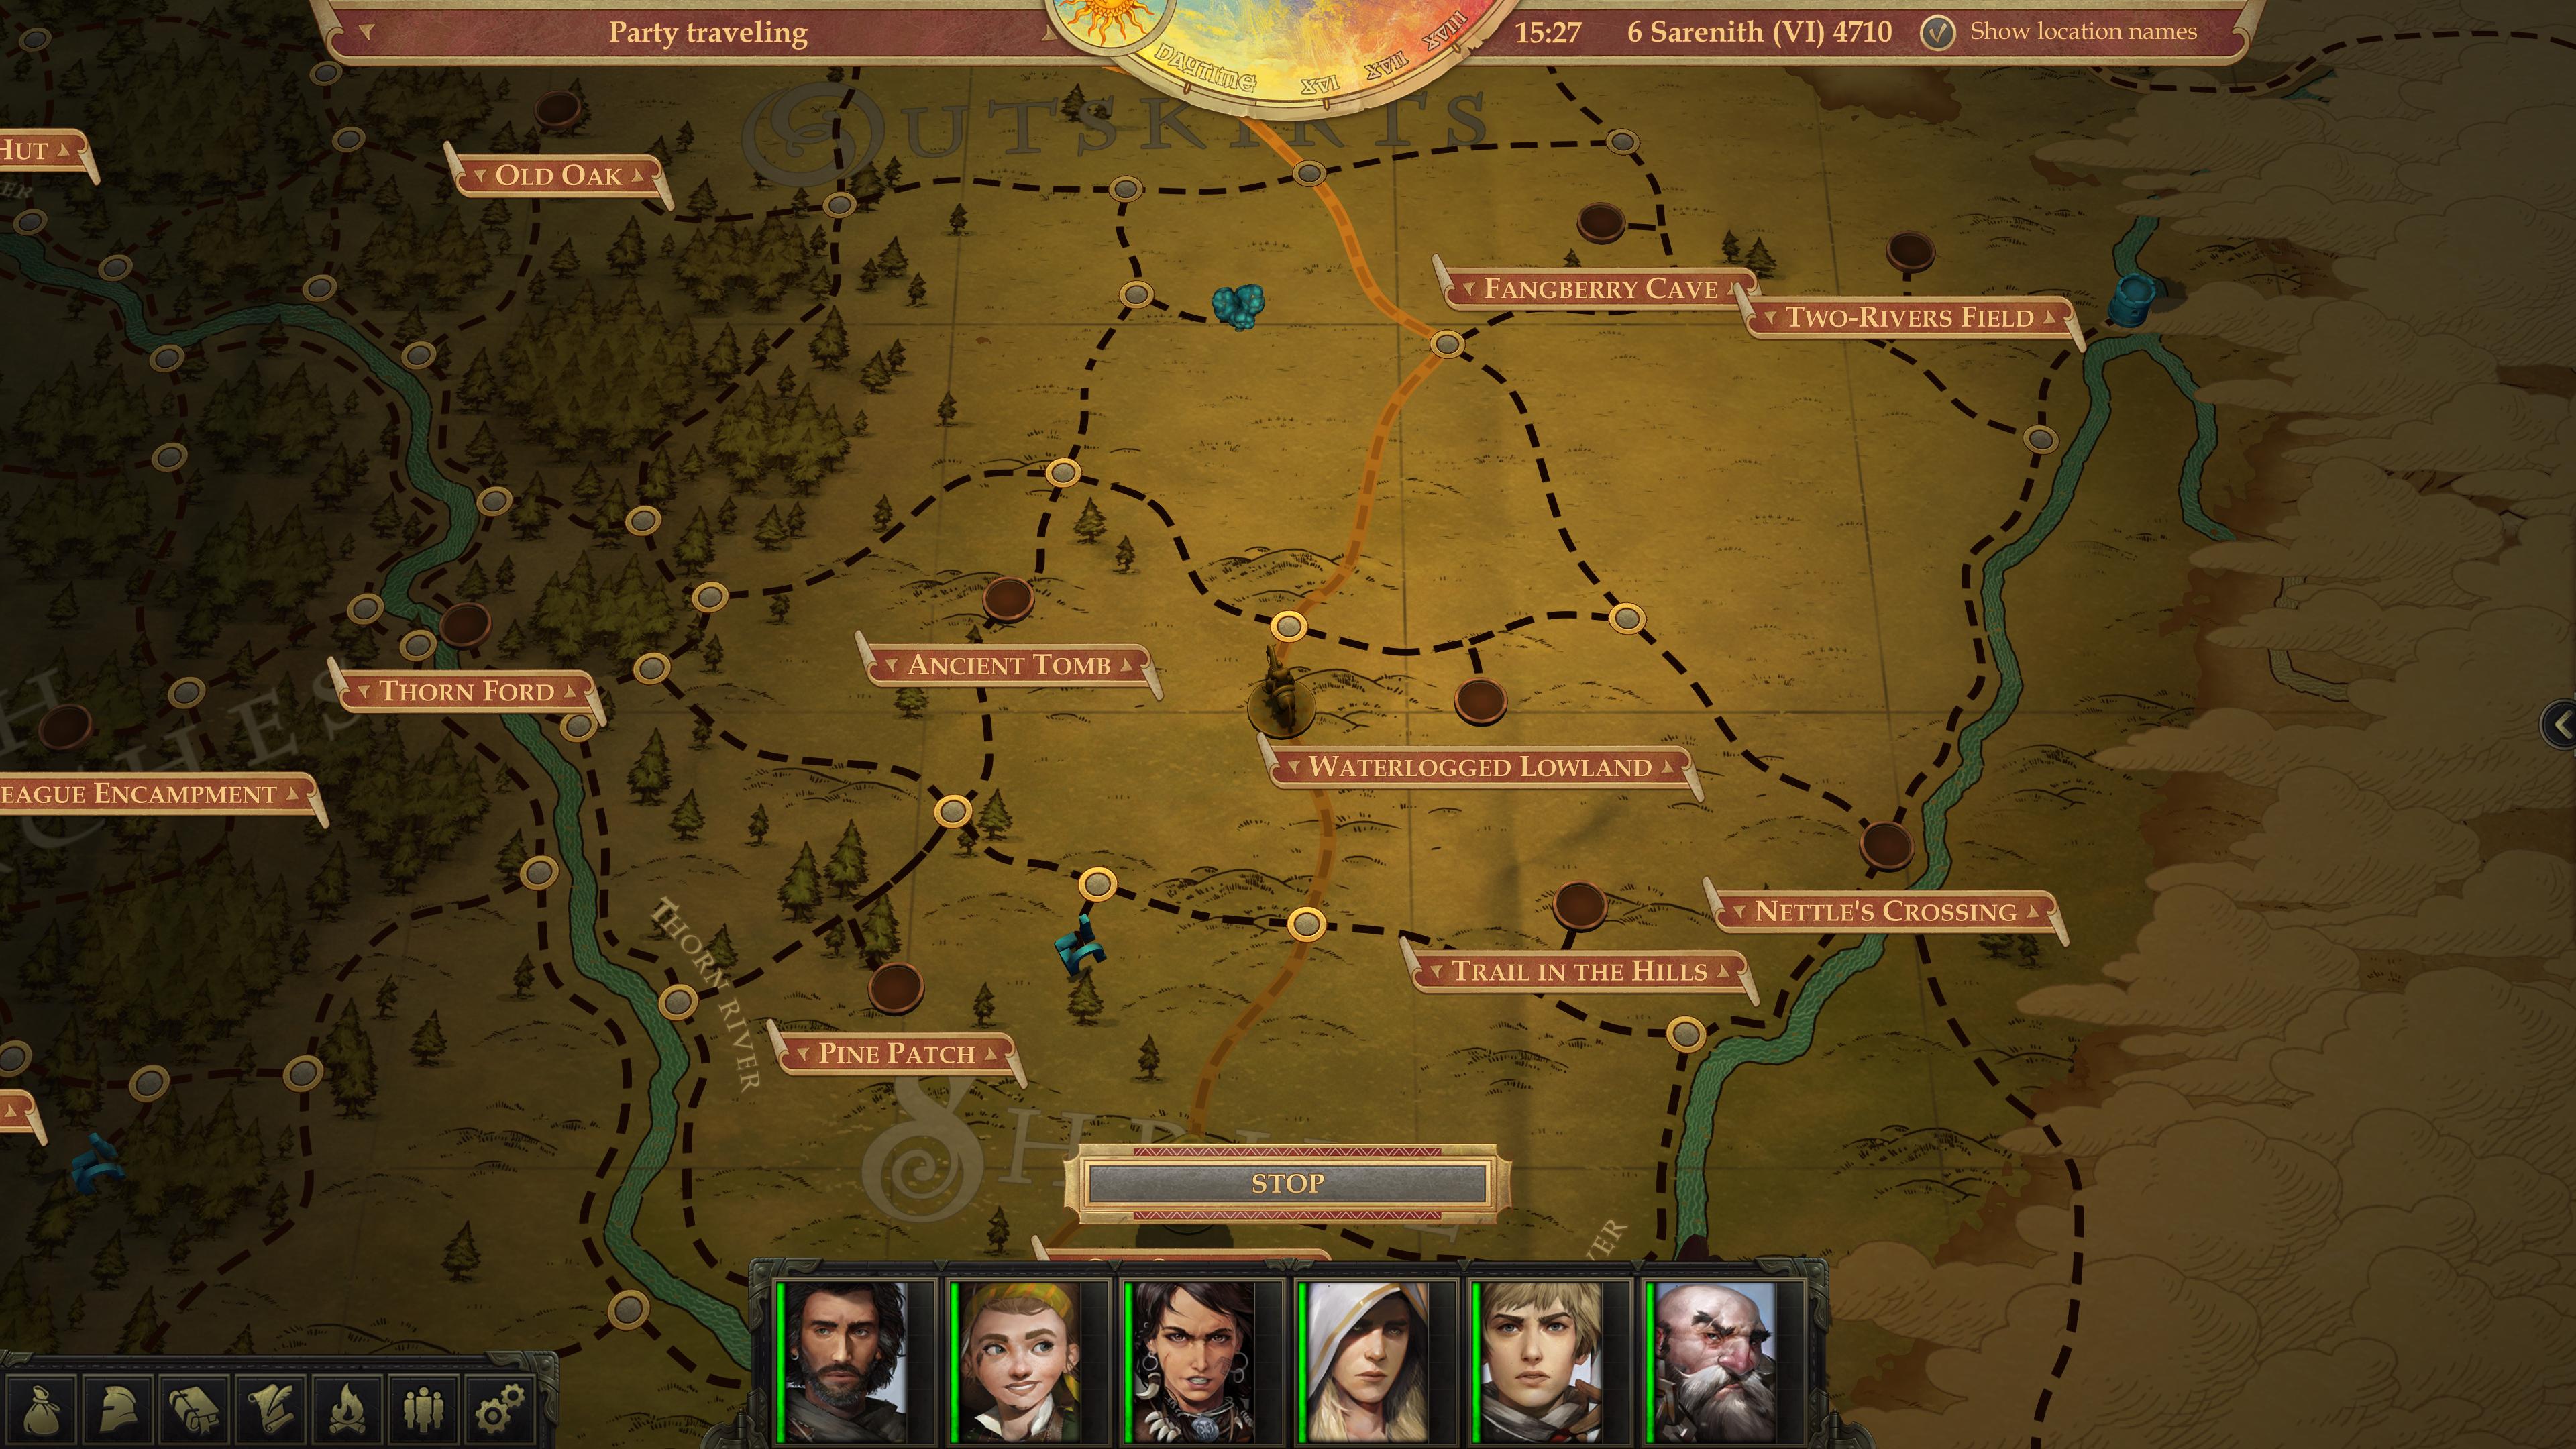 Pathfinder: Kingmaker Review | RPG Site